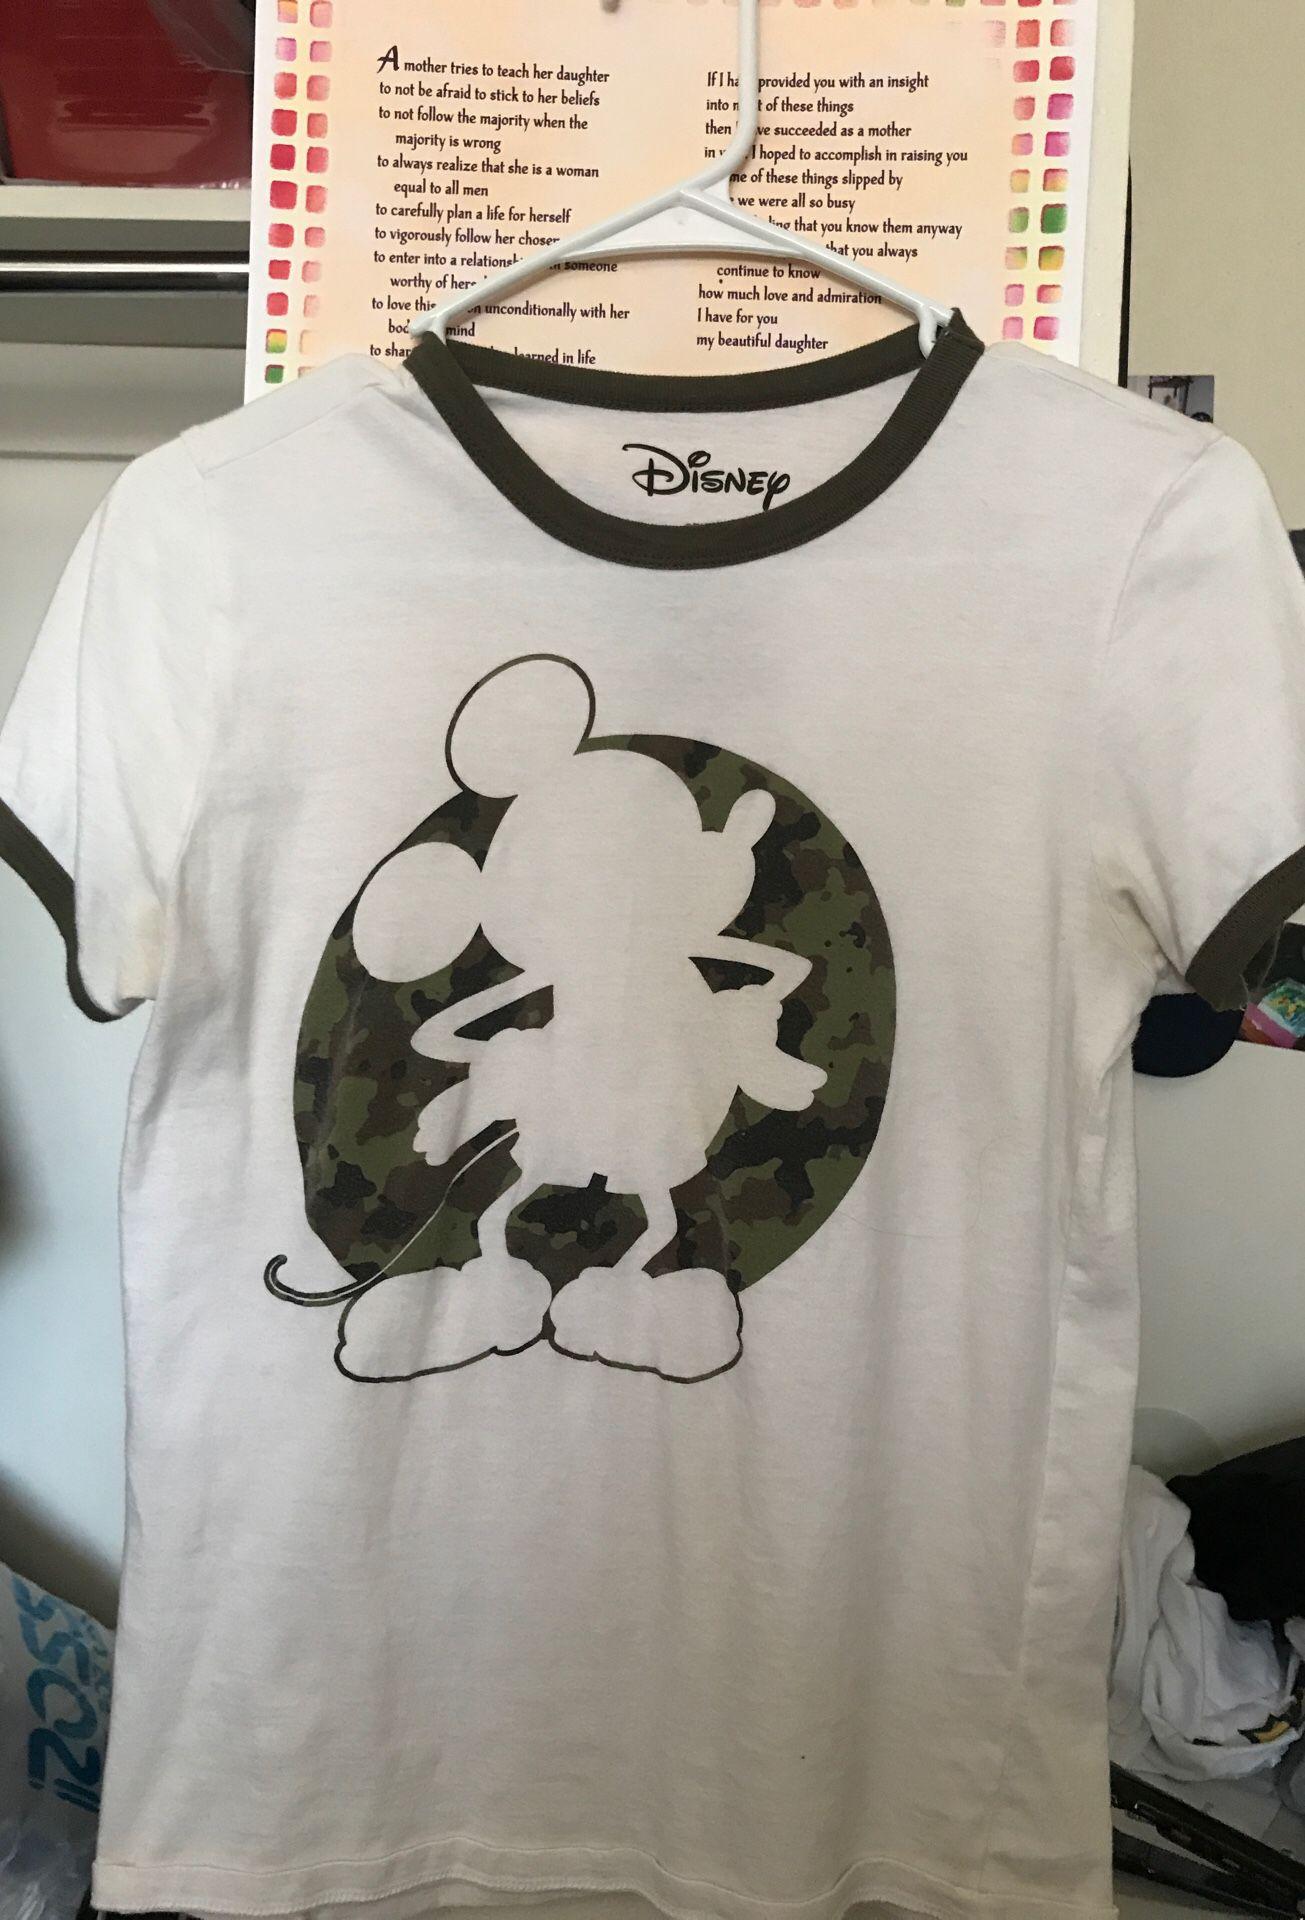 Woman's Mickey Mouse Disney shirt